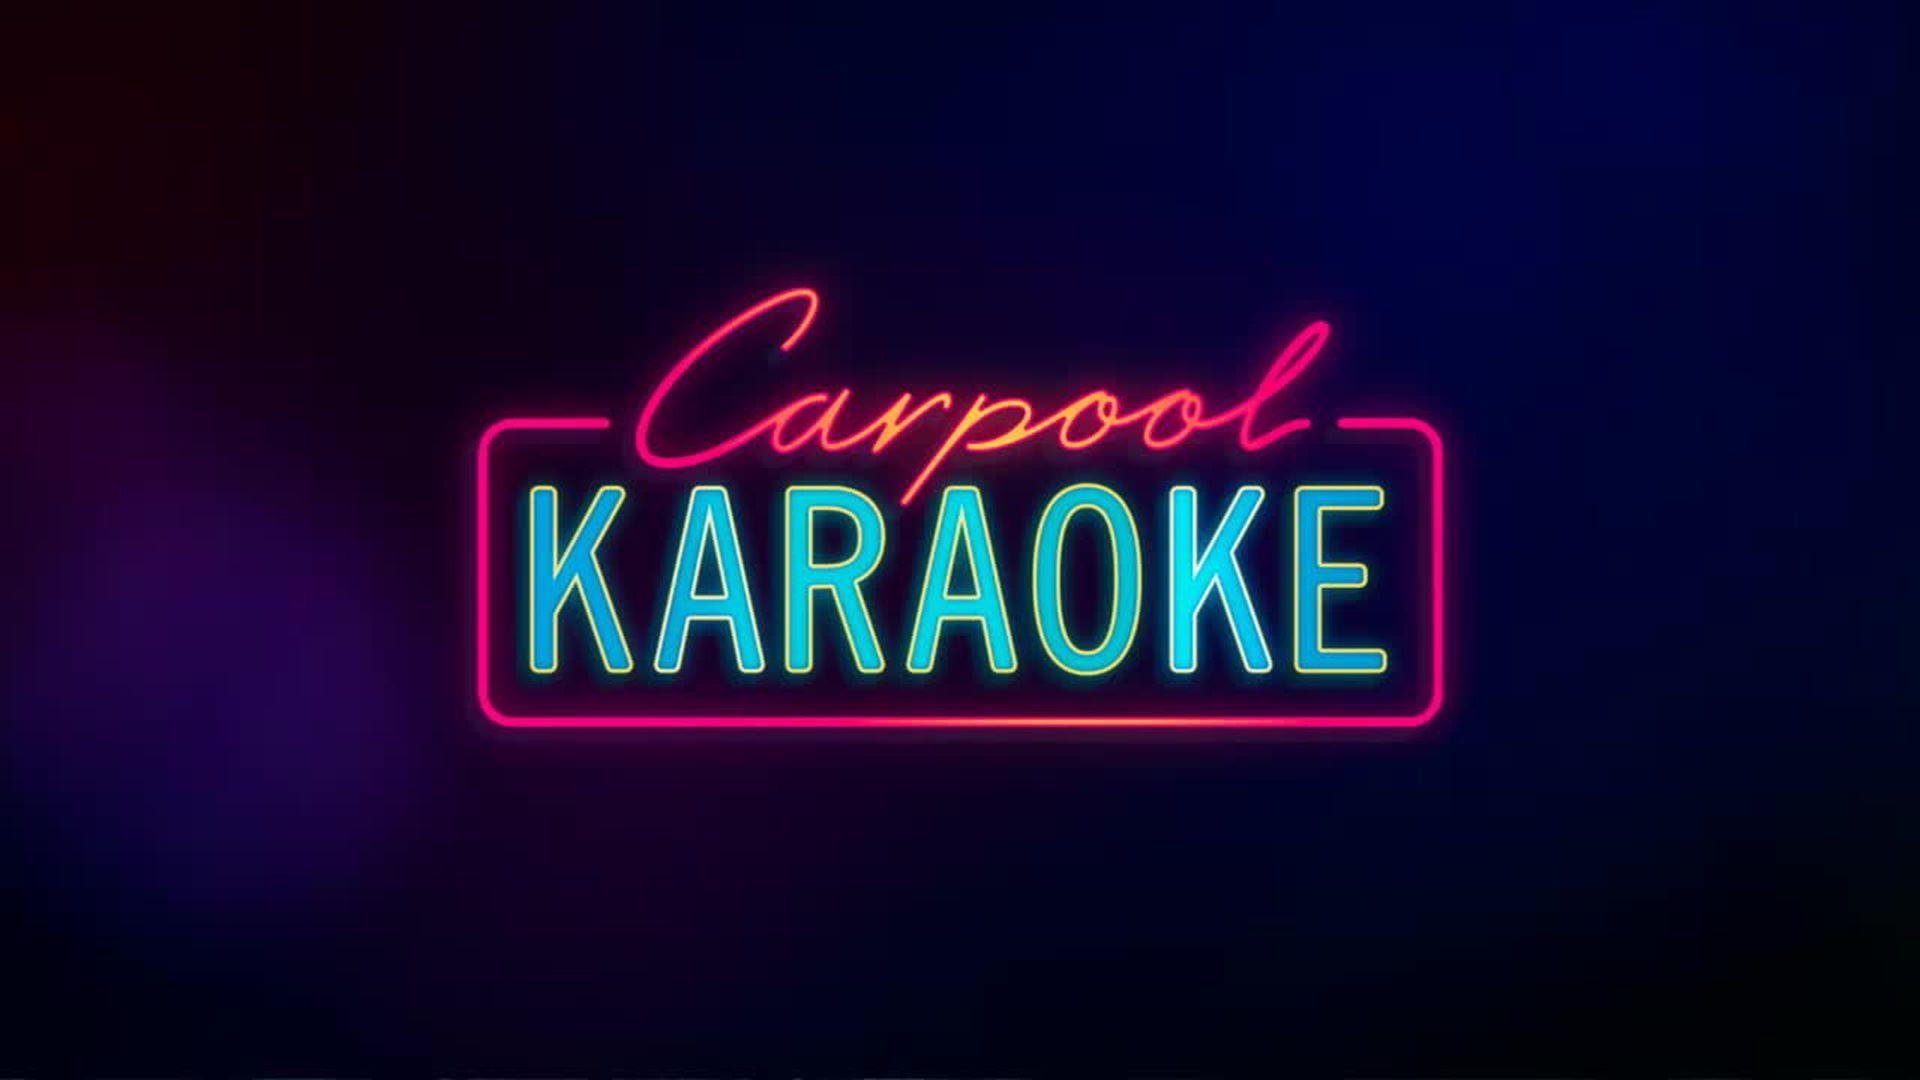 Apple Drops a New Trailer for the Carpool Karaoke Series